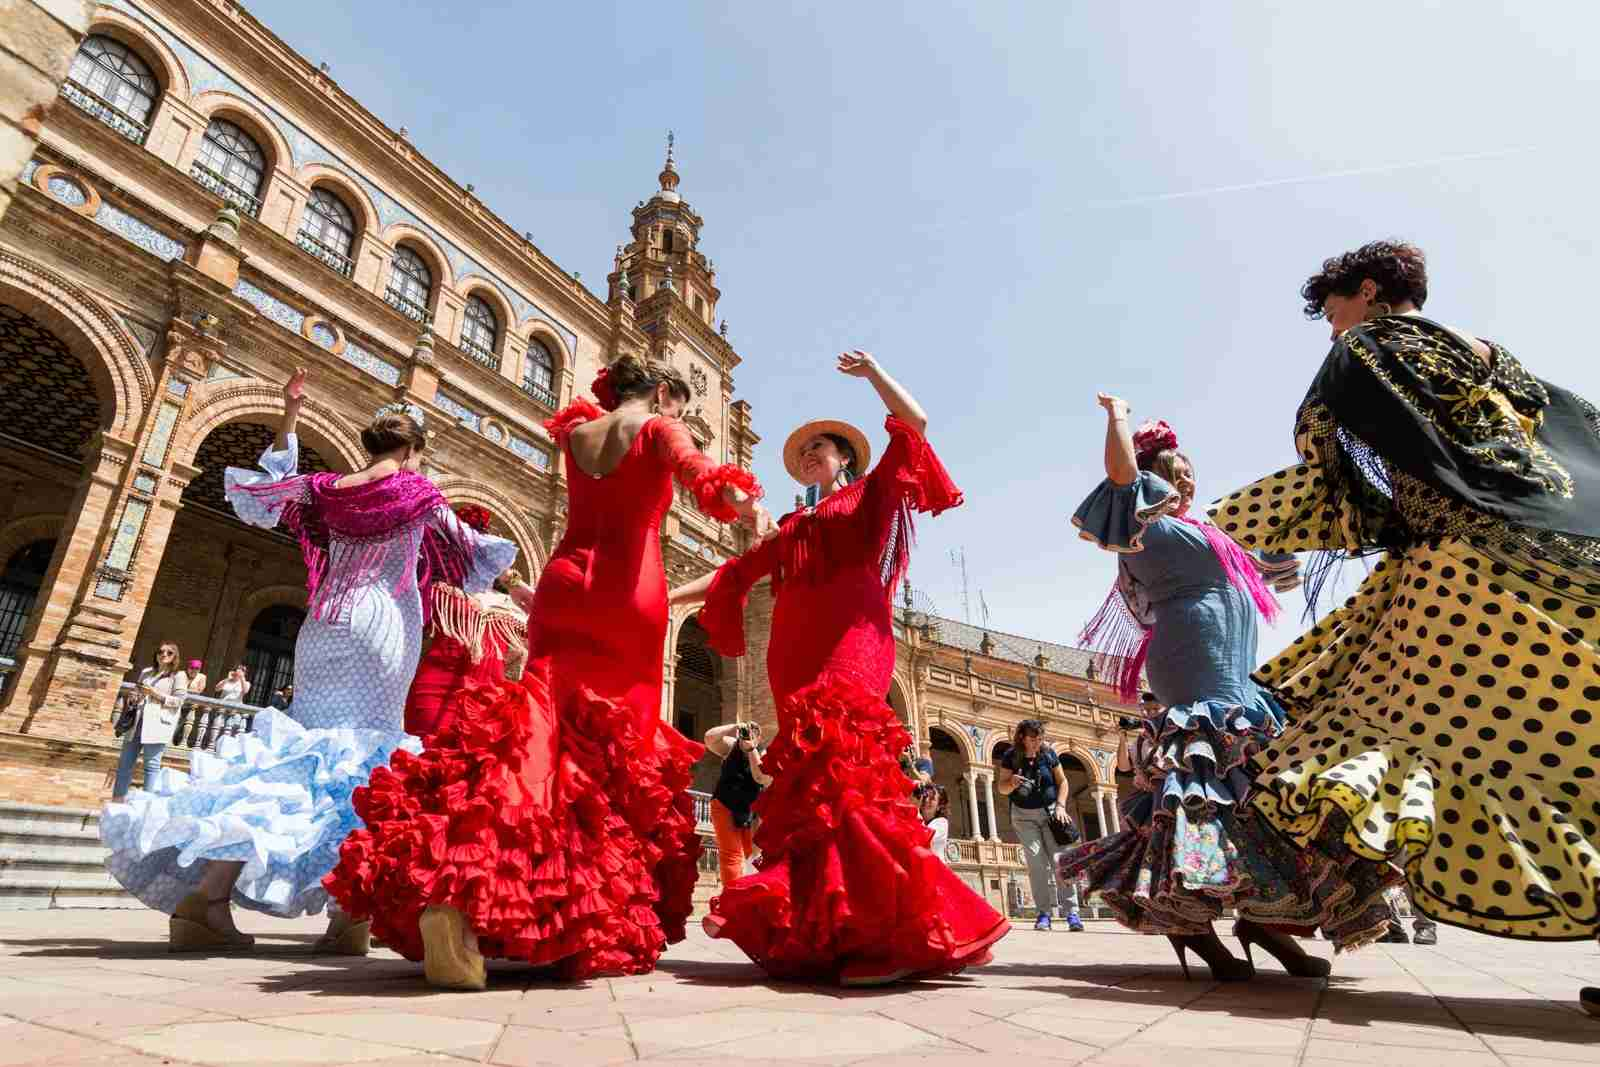 Women dancing flamenco on Plaza de Espana during Seville